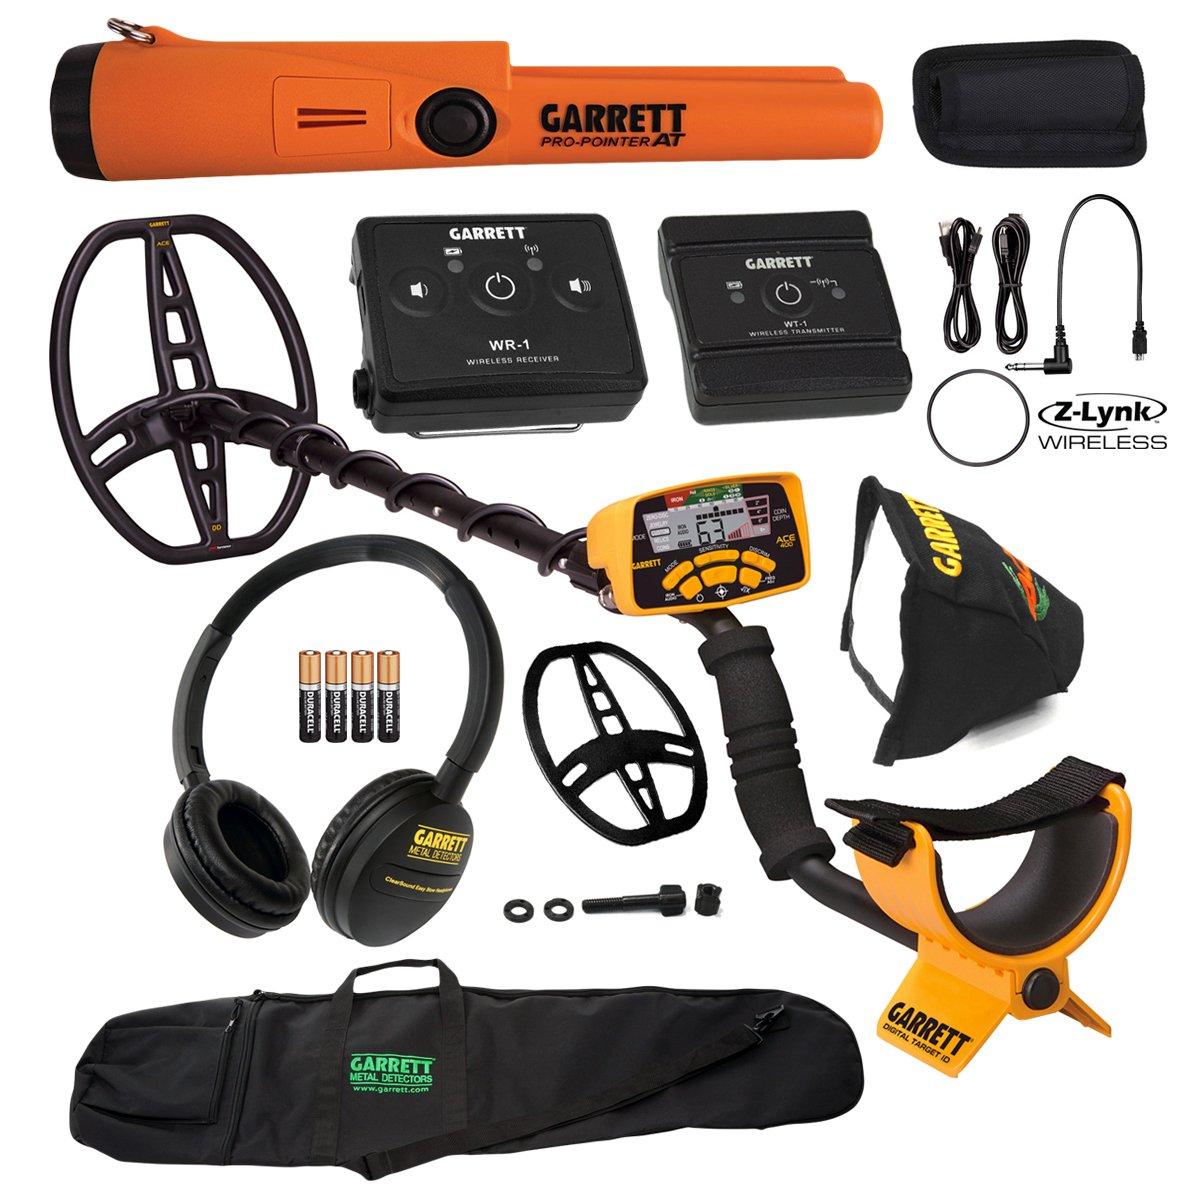 Garrett ACE 400 Metal Detector w/ Z-Lynk Wireless System, Pro Pointer AT & Bag